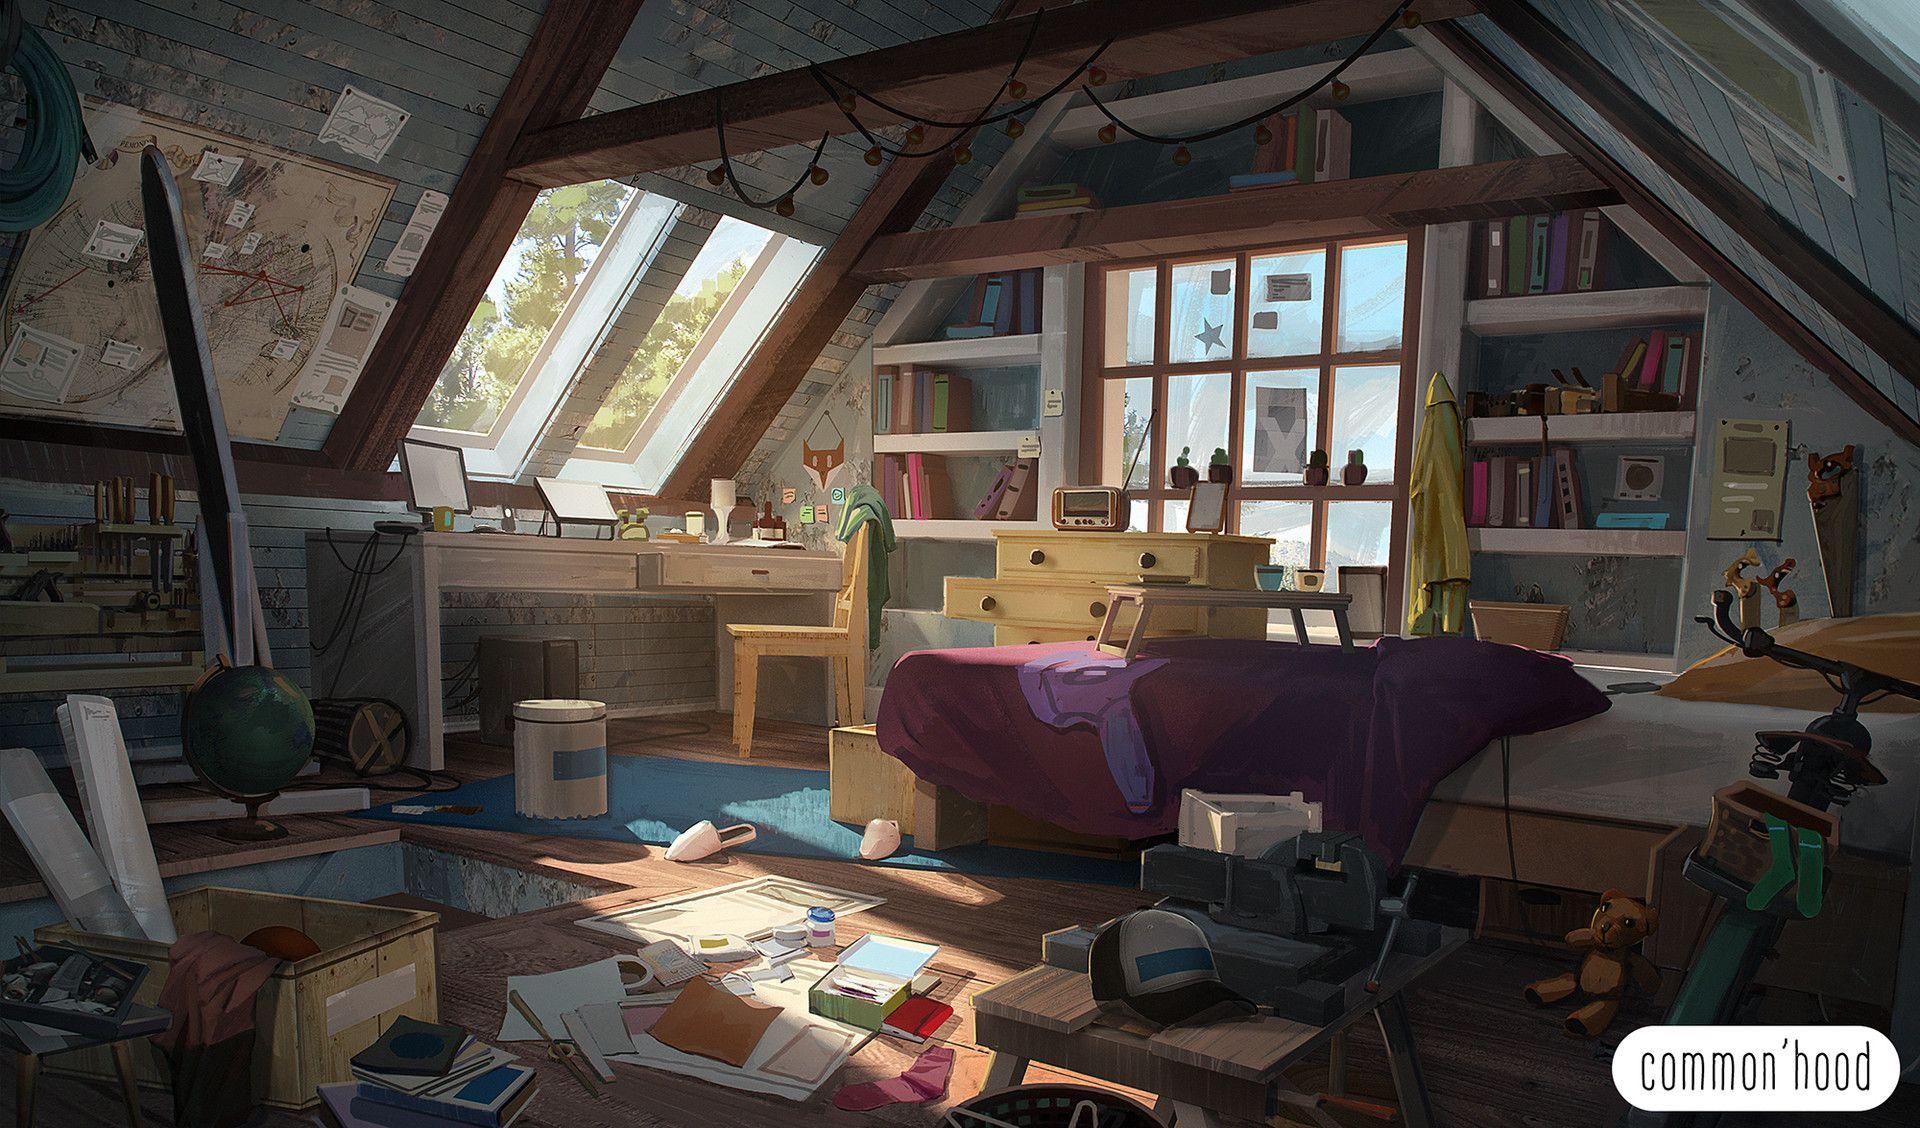 Not Real But Still Cozy 1920 X 1128 Check Out Desigedecors Com To Get More Inspiration Inte Artstation Concept Art Pixar Concept Art Environment Concept Art